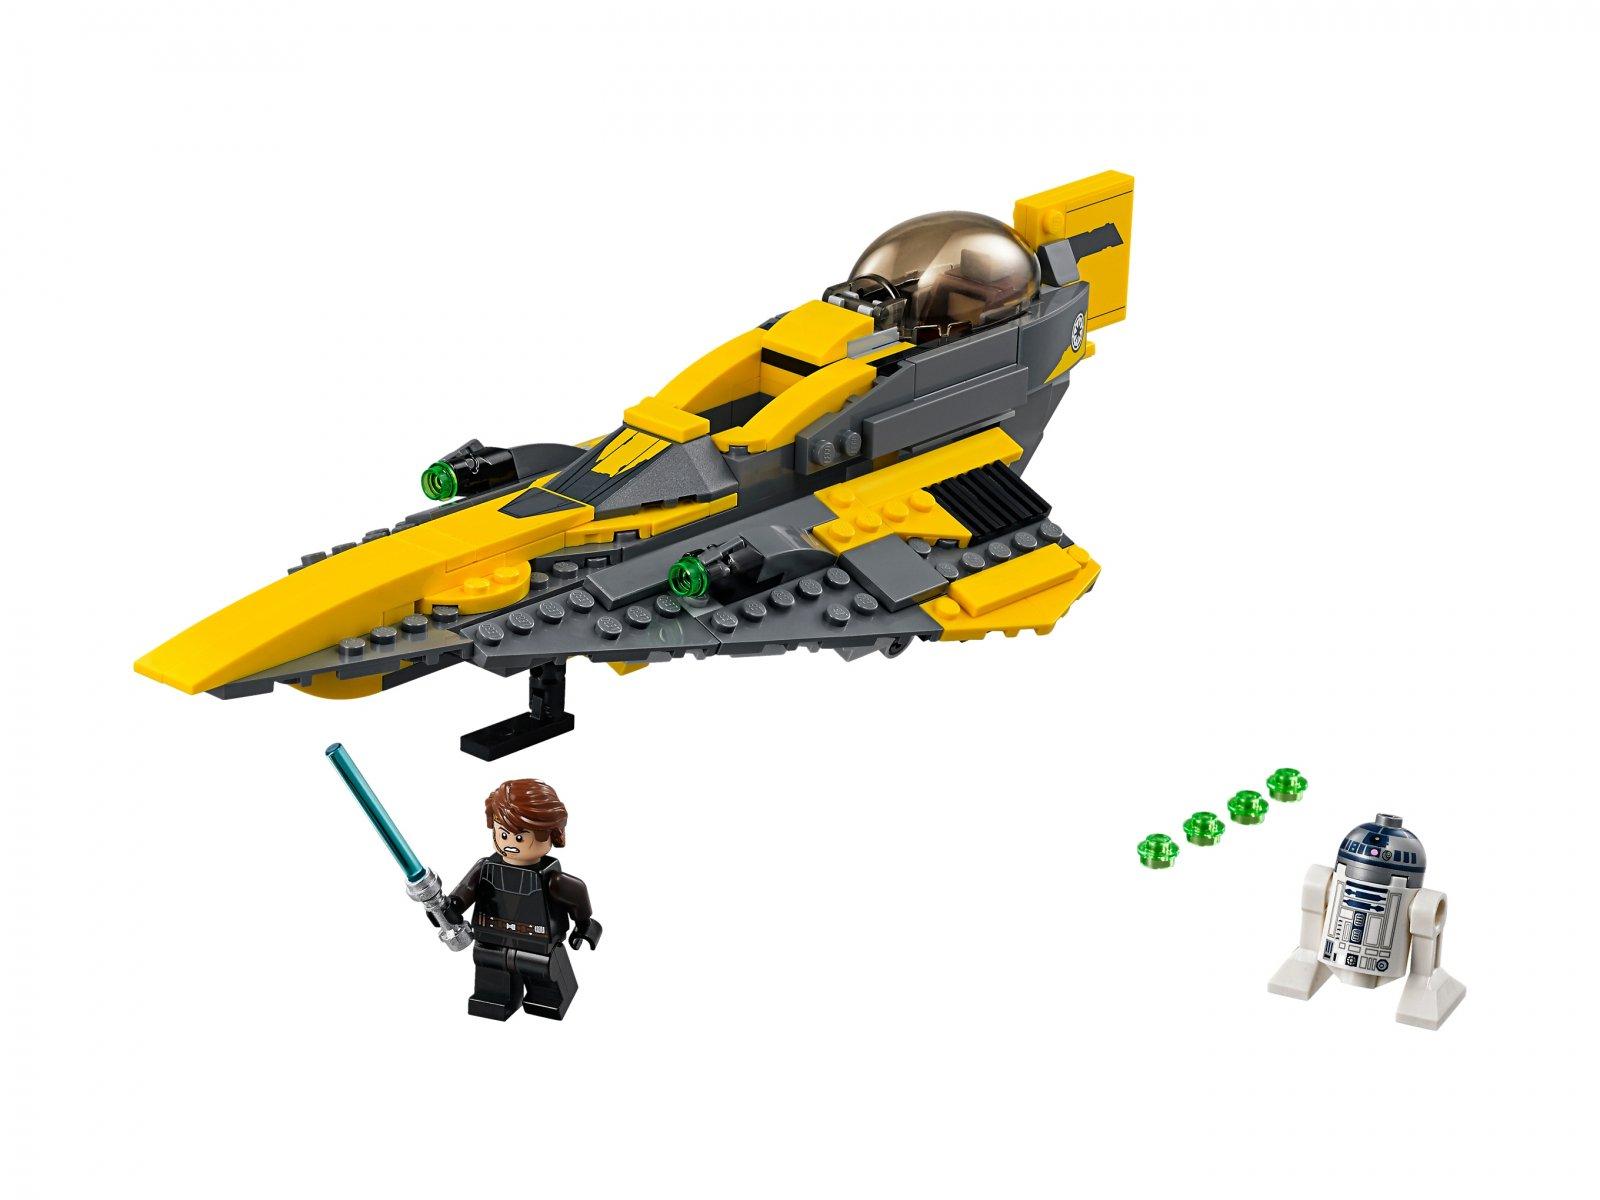 LEGO Star Wars™ Jedi Starfighter Anakina™ 75214